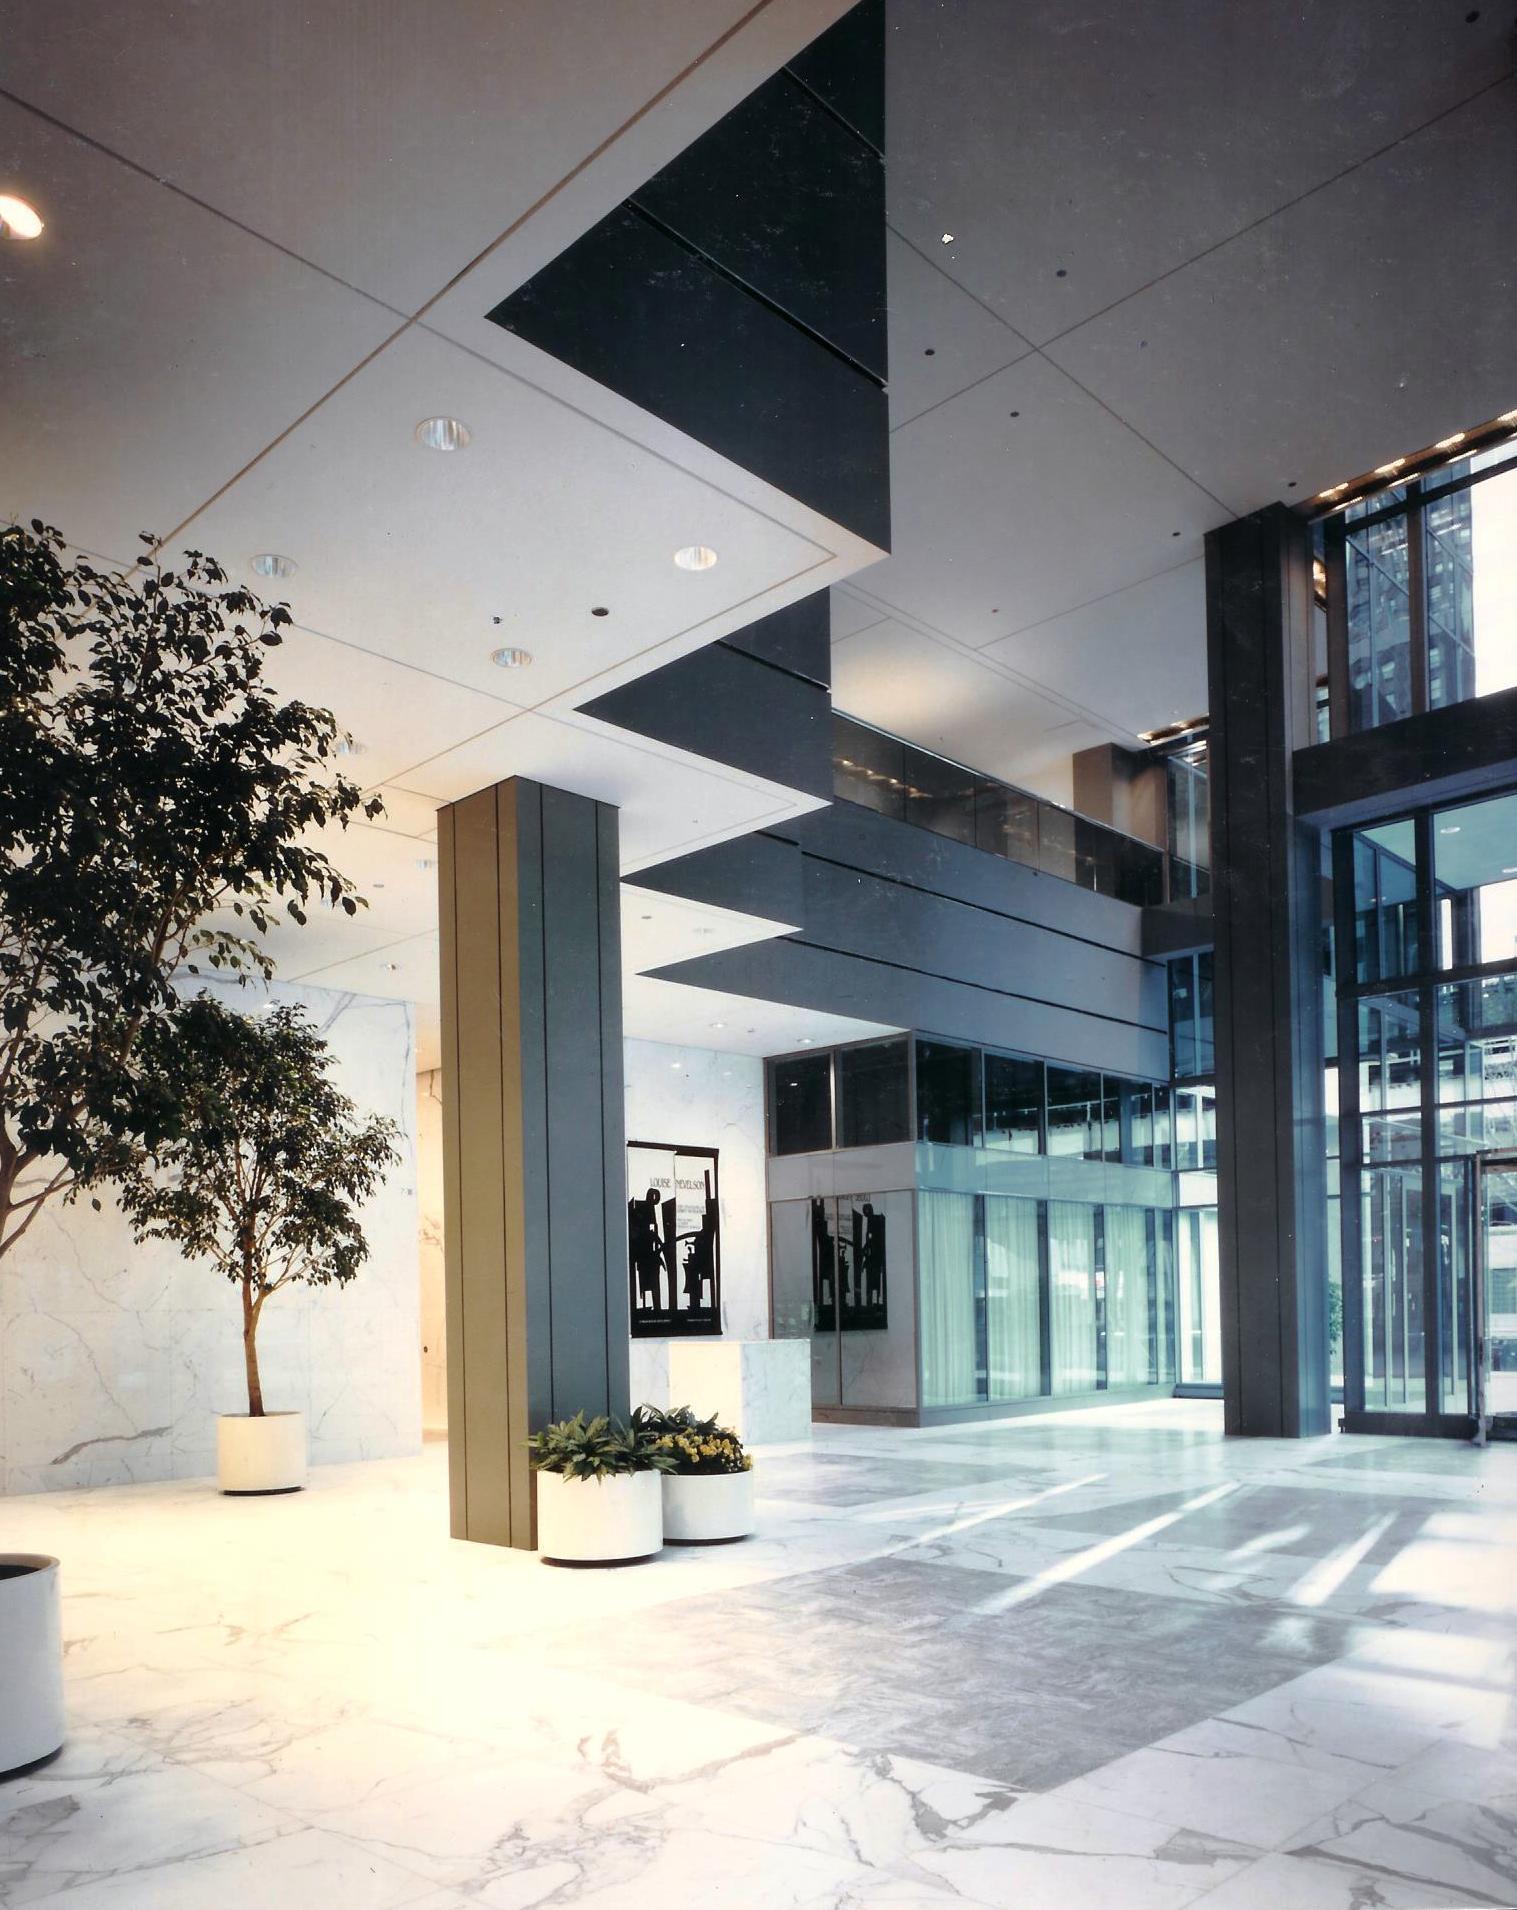 Arc services architectural concepts commercial for Ads architectural design services